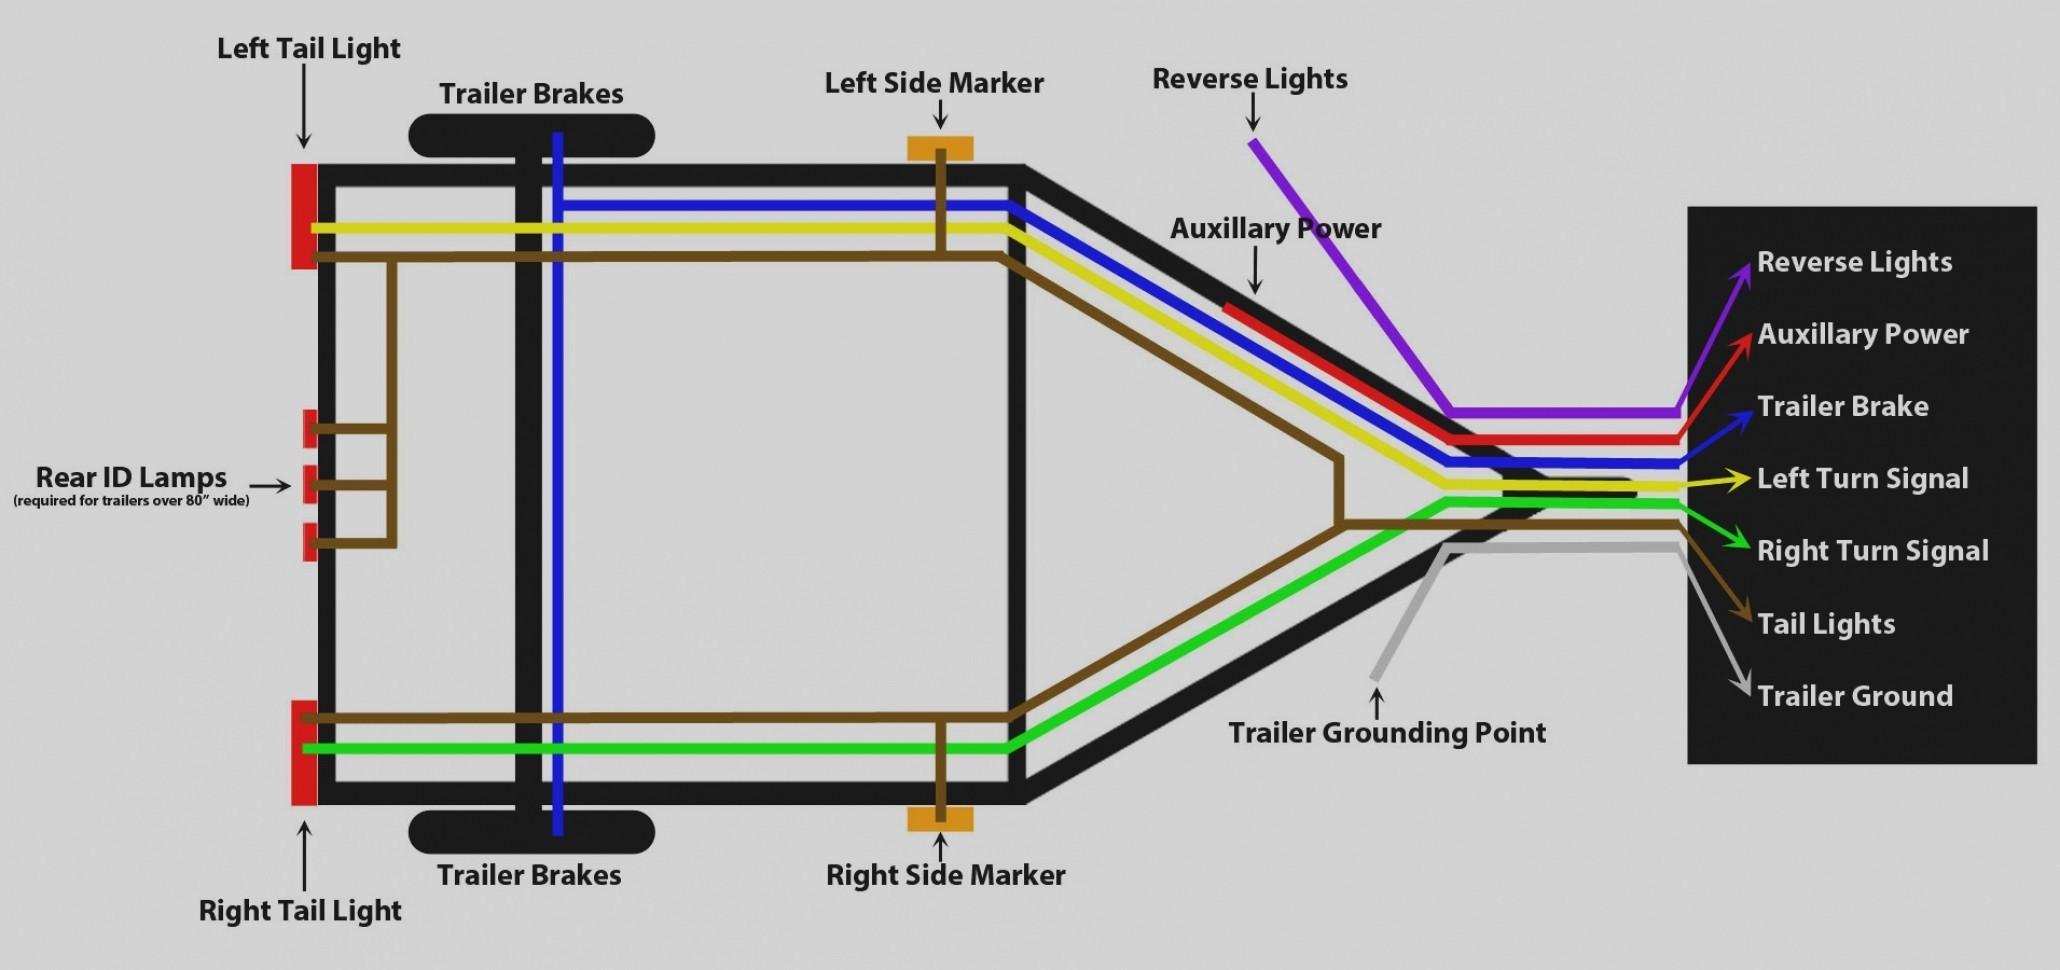 [DIAGRAM_1JK]  LM_5509] Cargo Mate Utility Trailer Wiring Diagram Free Picture Schematic  Wiring | Wells Cargo Wiring Diagrams |  | Mimig Xtern Bios Attr Menia Ehir Amenti Xolia Nful Mohammedshrine Librar  Wiring 101